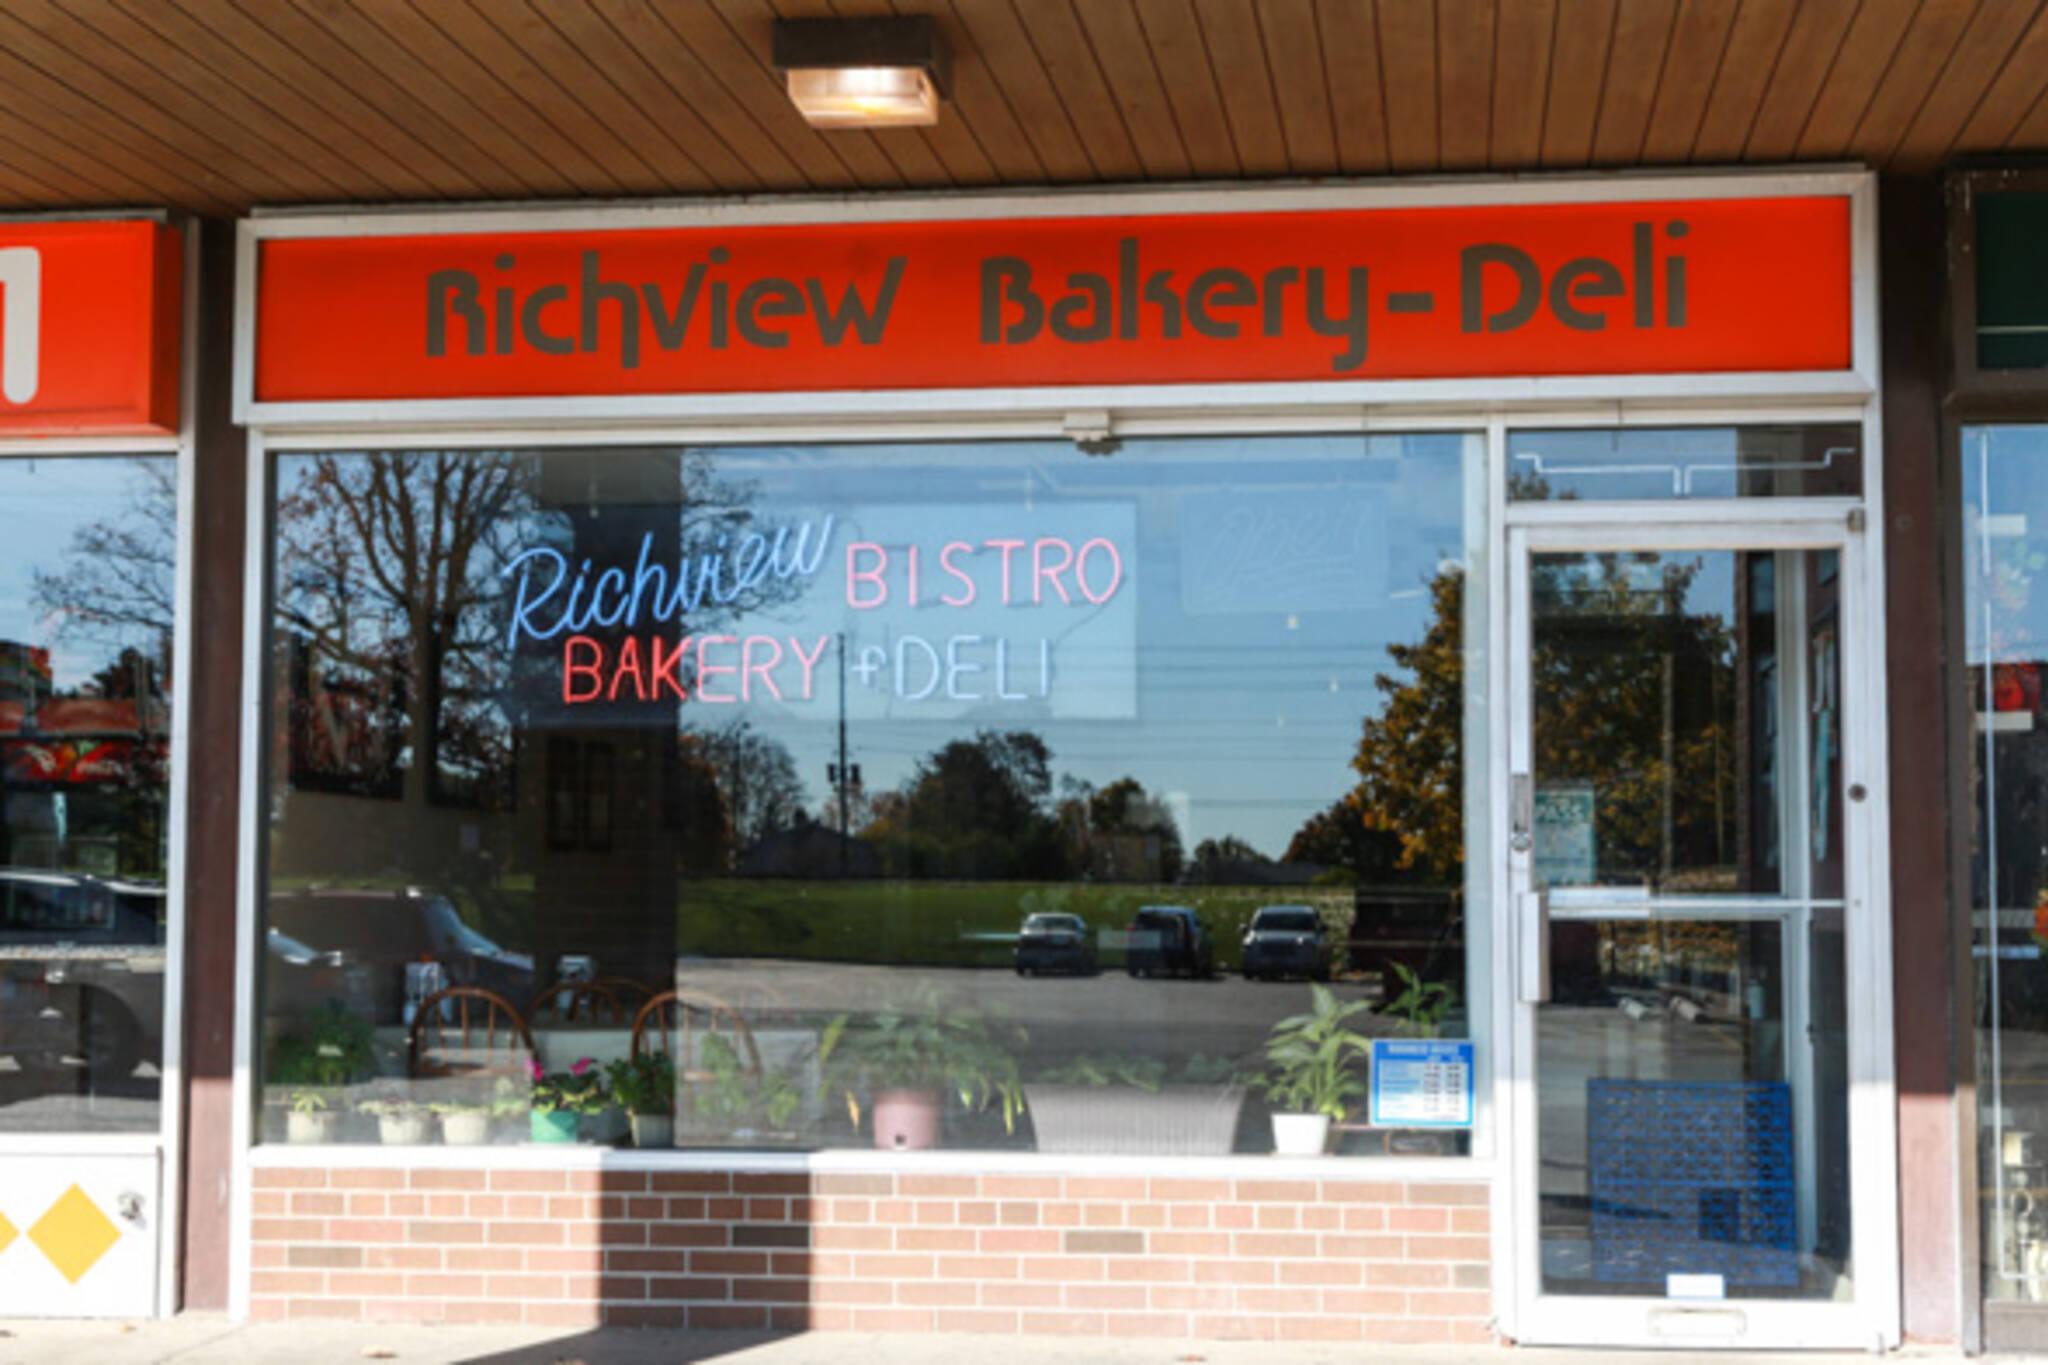 richview bakery deli